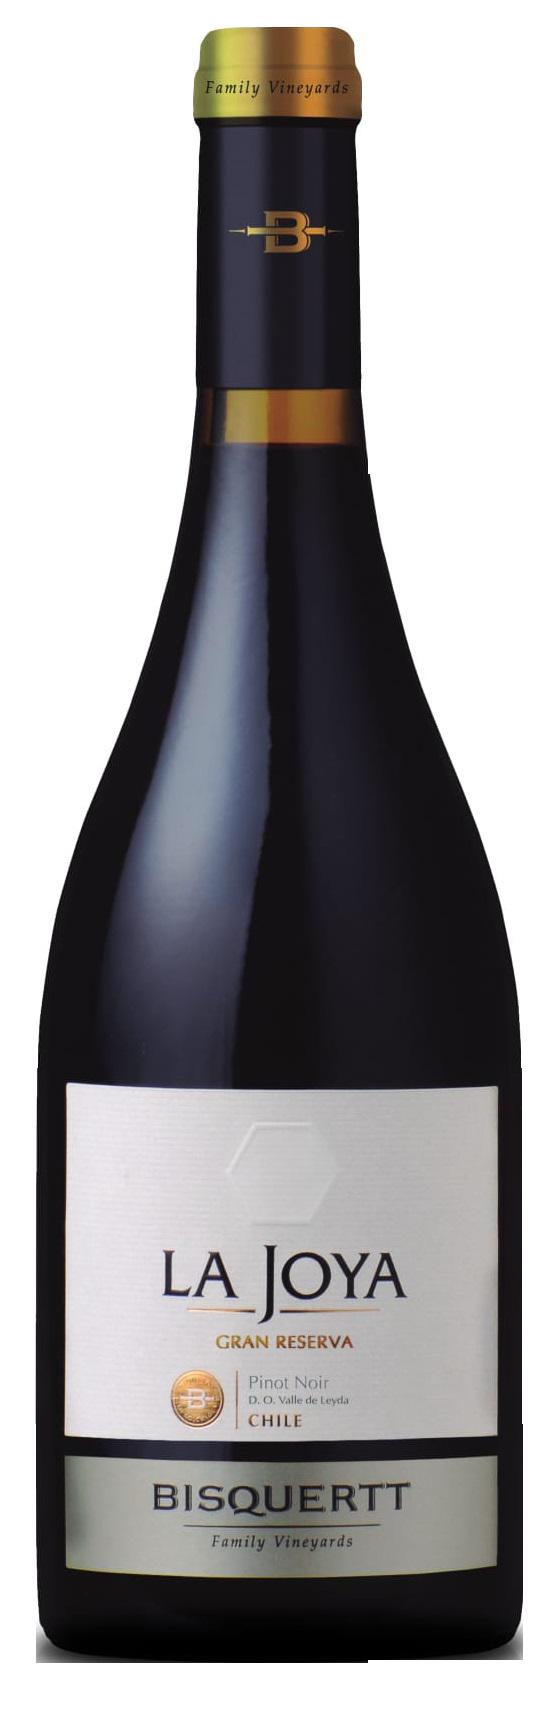 Bisquertt La Joya Gran Reserva Pinot Noir